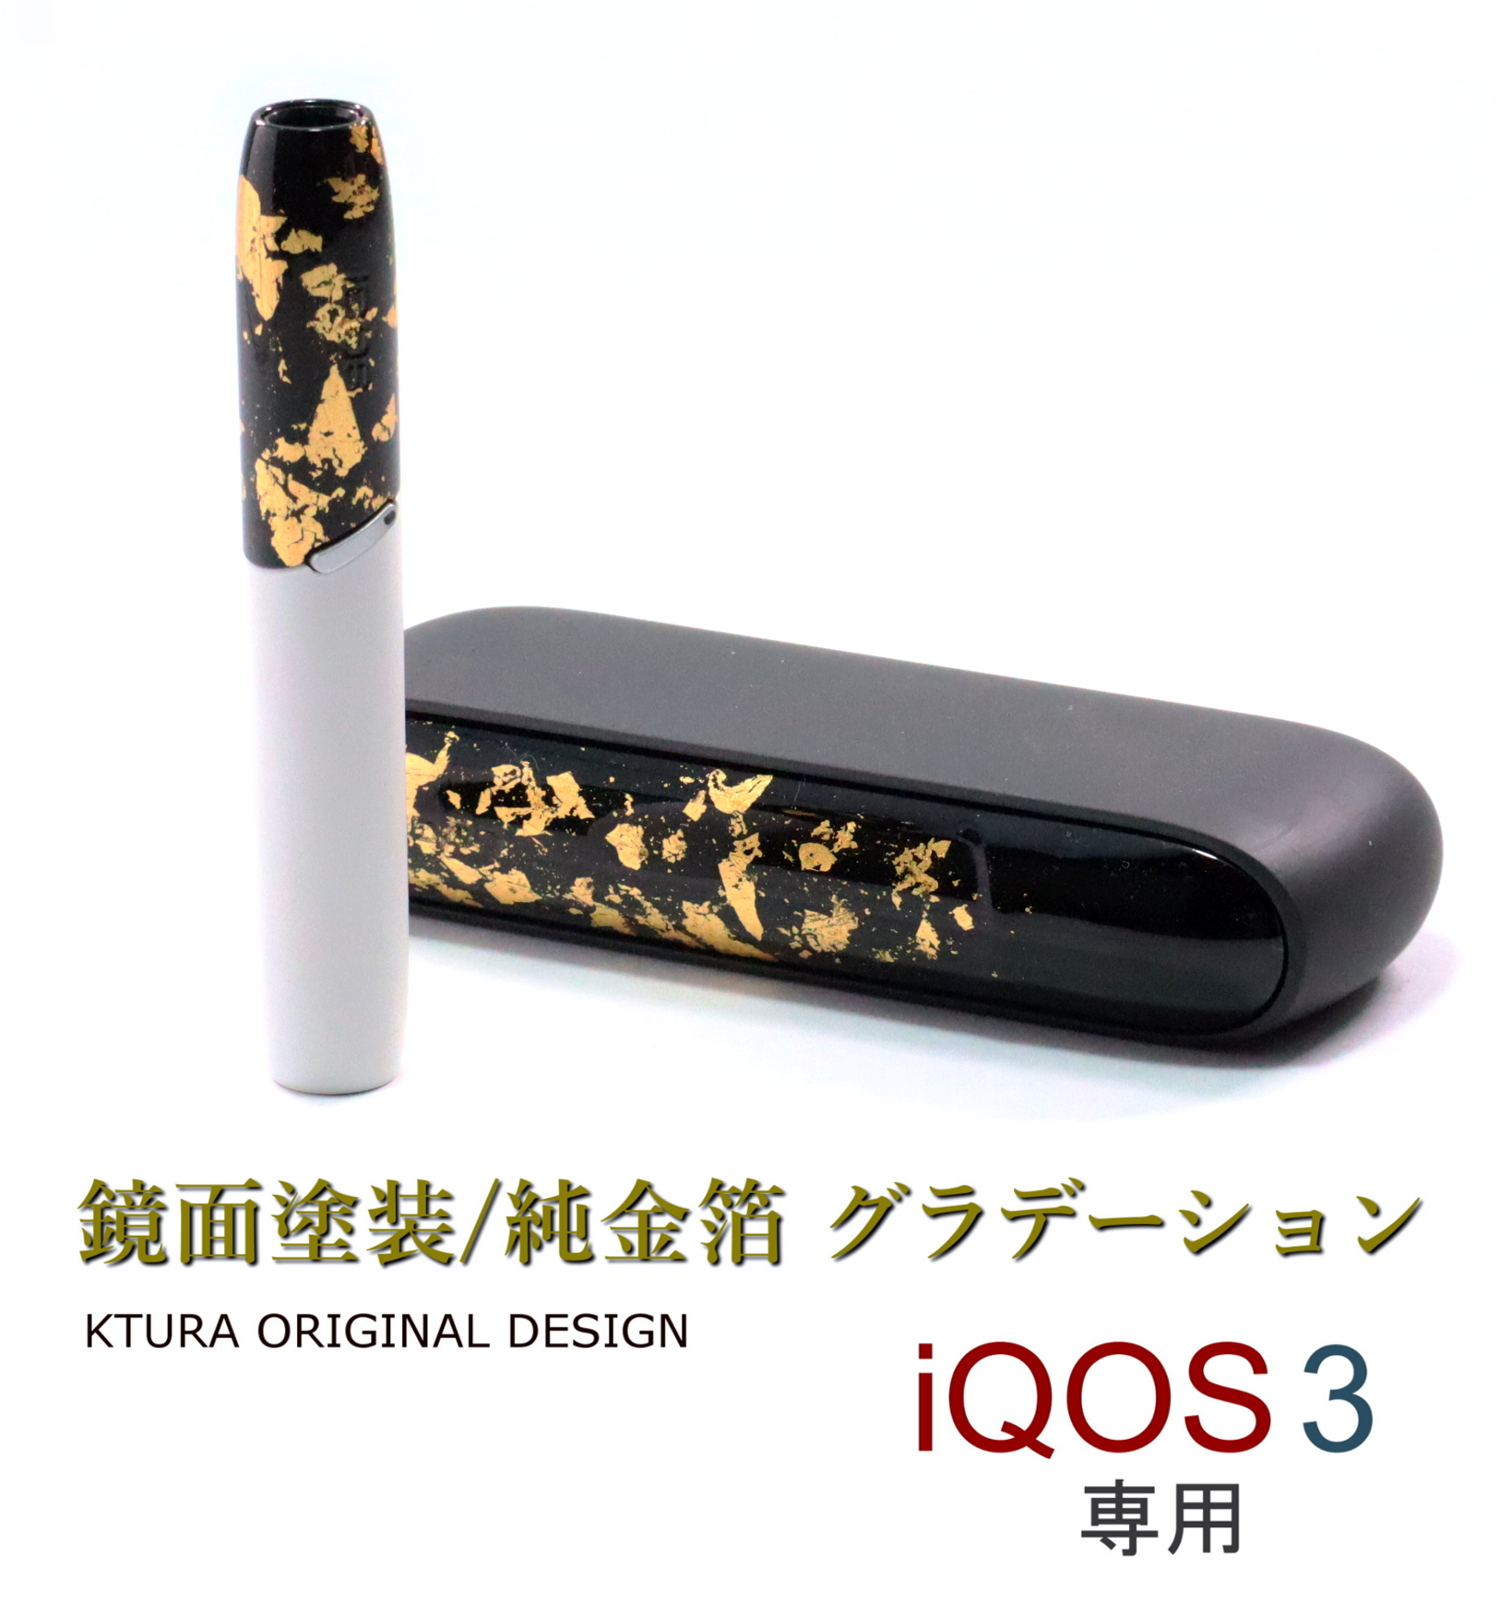 IQOS3 専用キャップ 【黒・赤・白】アイコス3